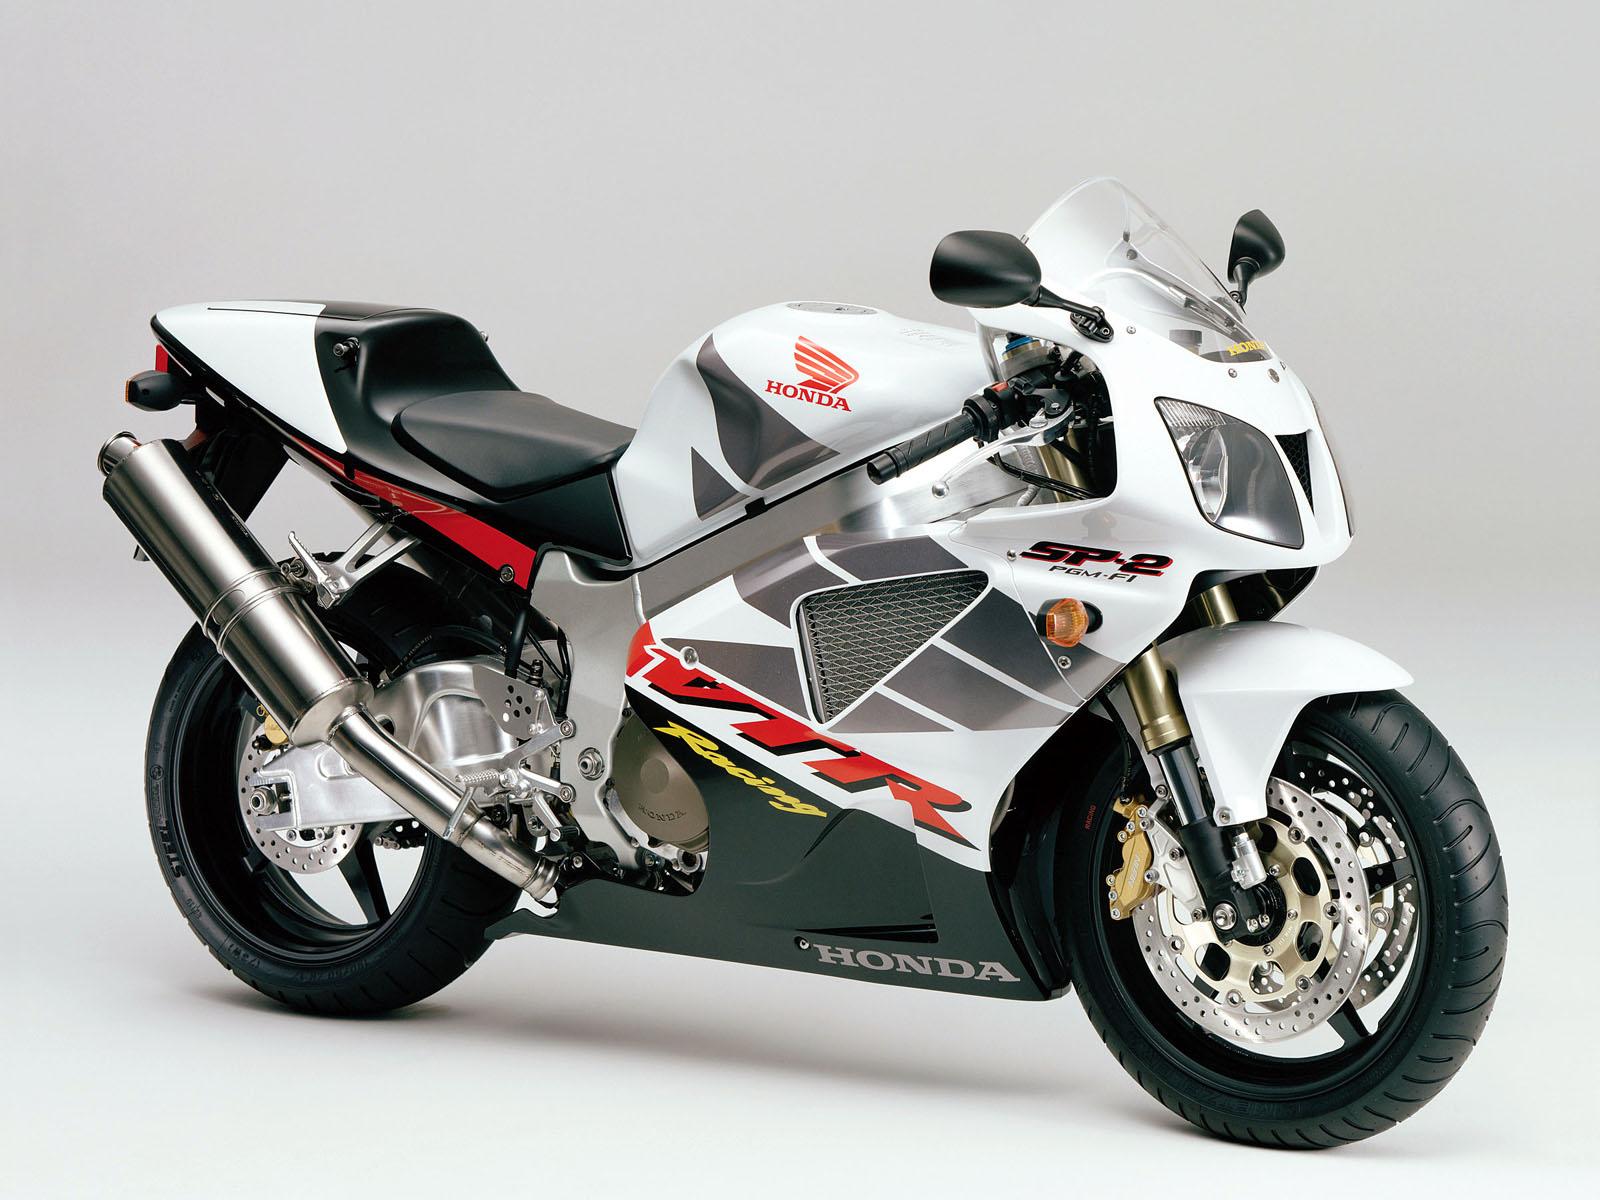 http://3.bp.blogspot.com/-VO9k6PWNDrs/US8KjLM_XPI/AAAAAAAABRo/fH3jmNEwBGE/s1600/Honda-Bikes-Wallpaper-1.jpg